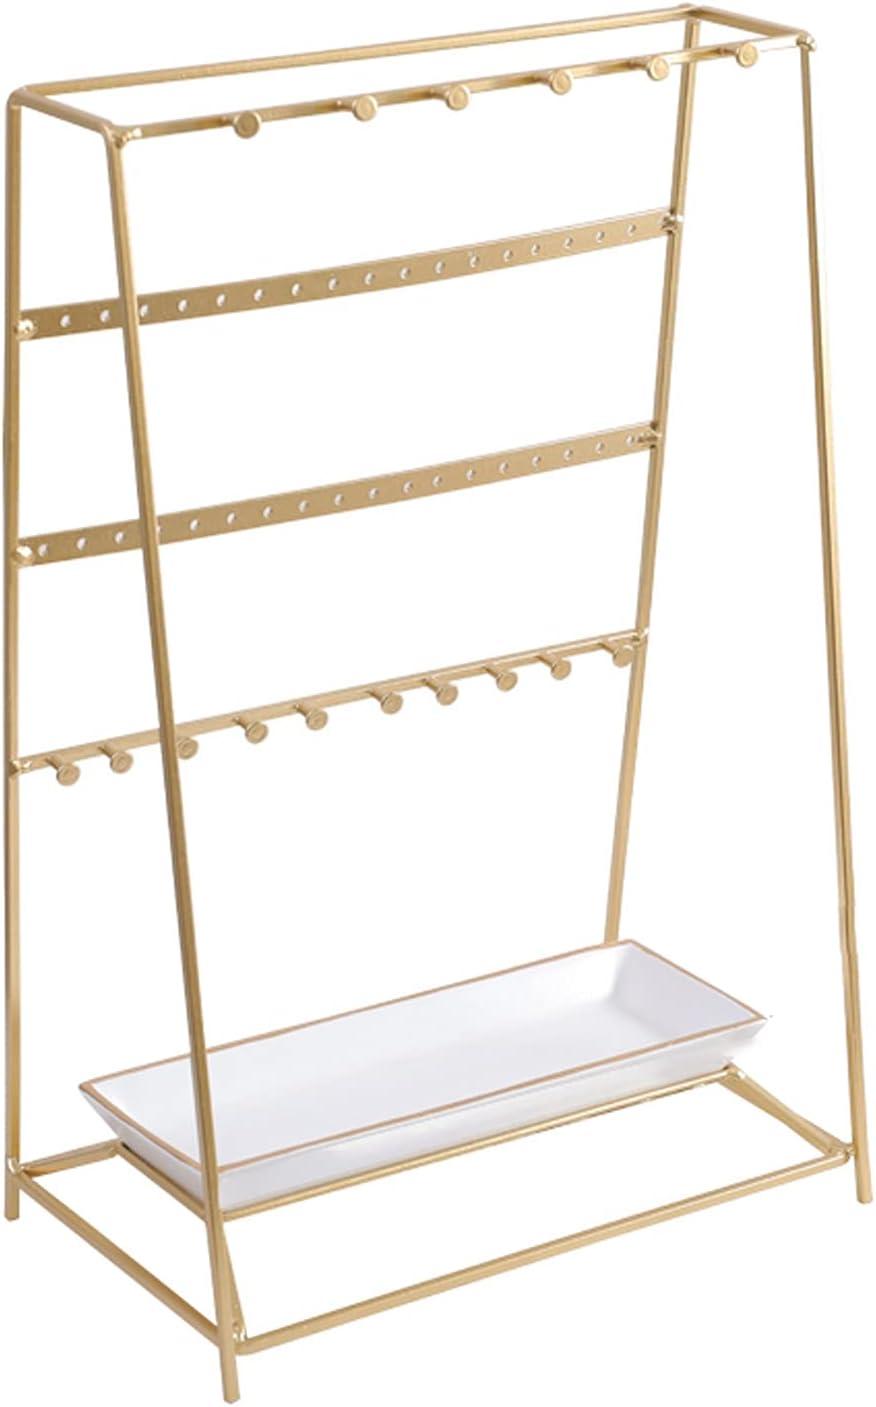 Spasm price Tingting1992 Jewelry Organizer Stand Jewel Table Dressing Max 87% OFF Golden